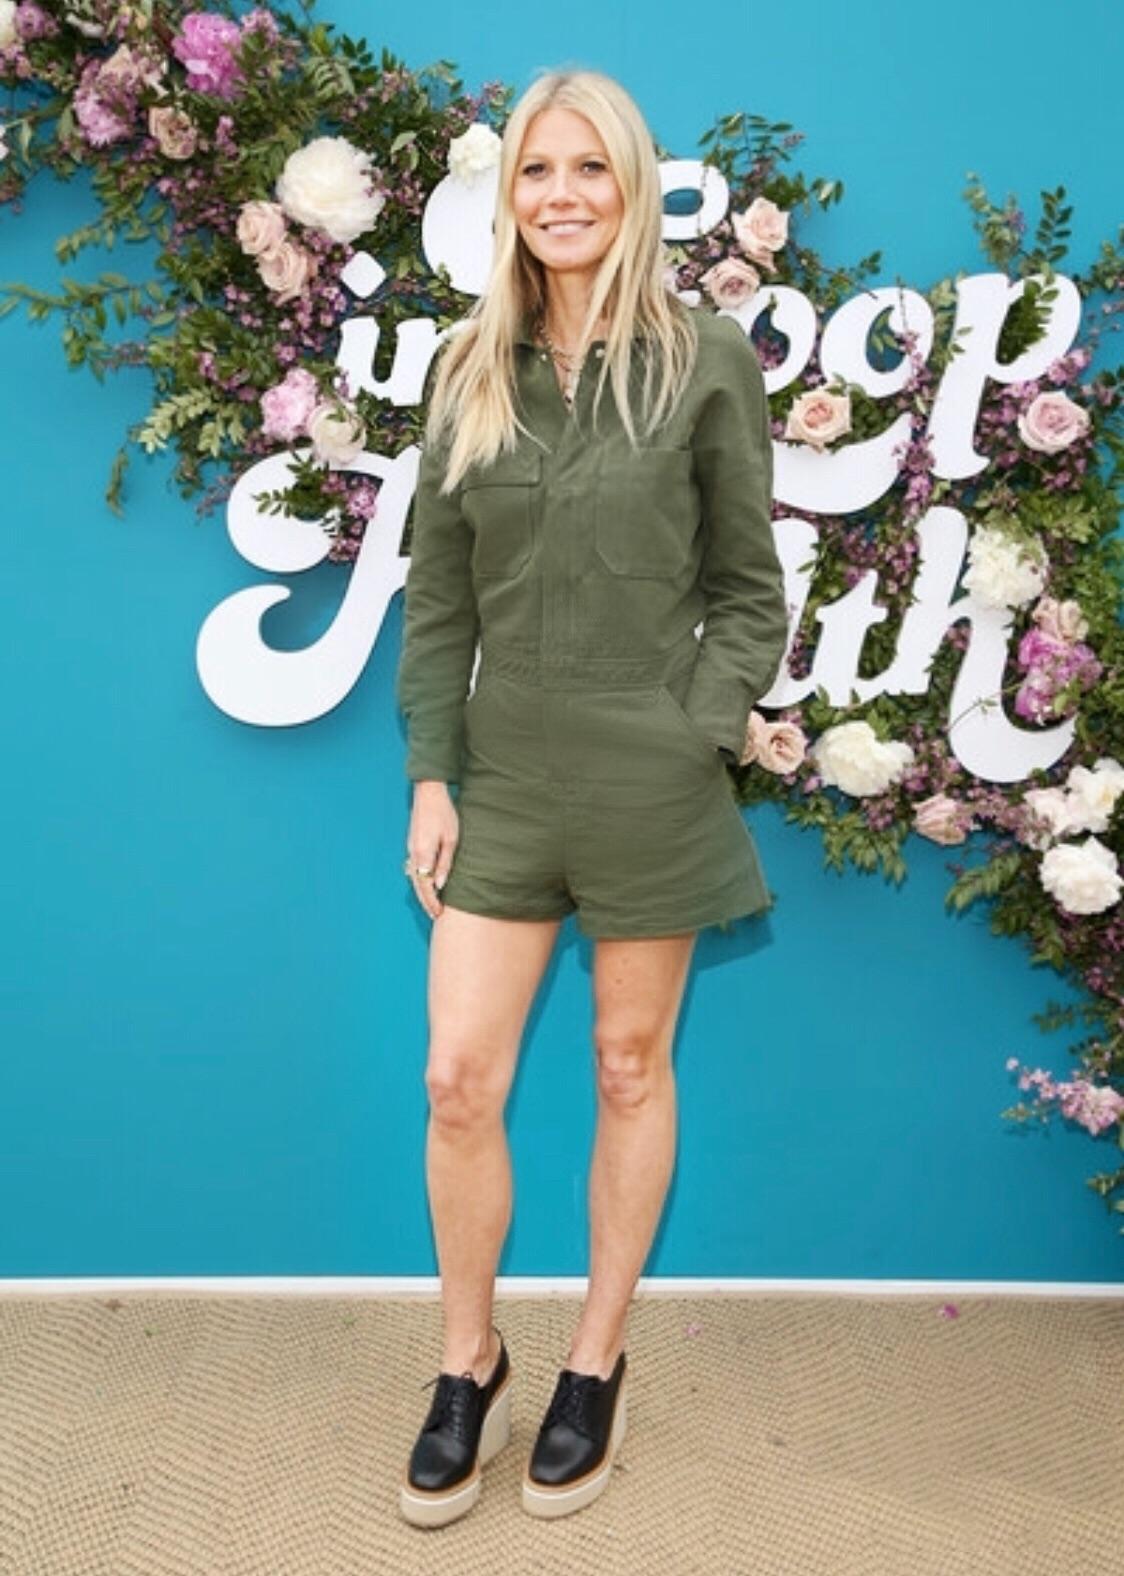 Gwyneth Paltrow for In Goop Health LA / Styled by Natalie Hoselton